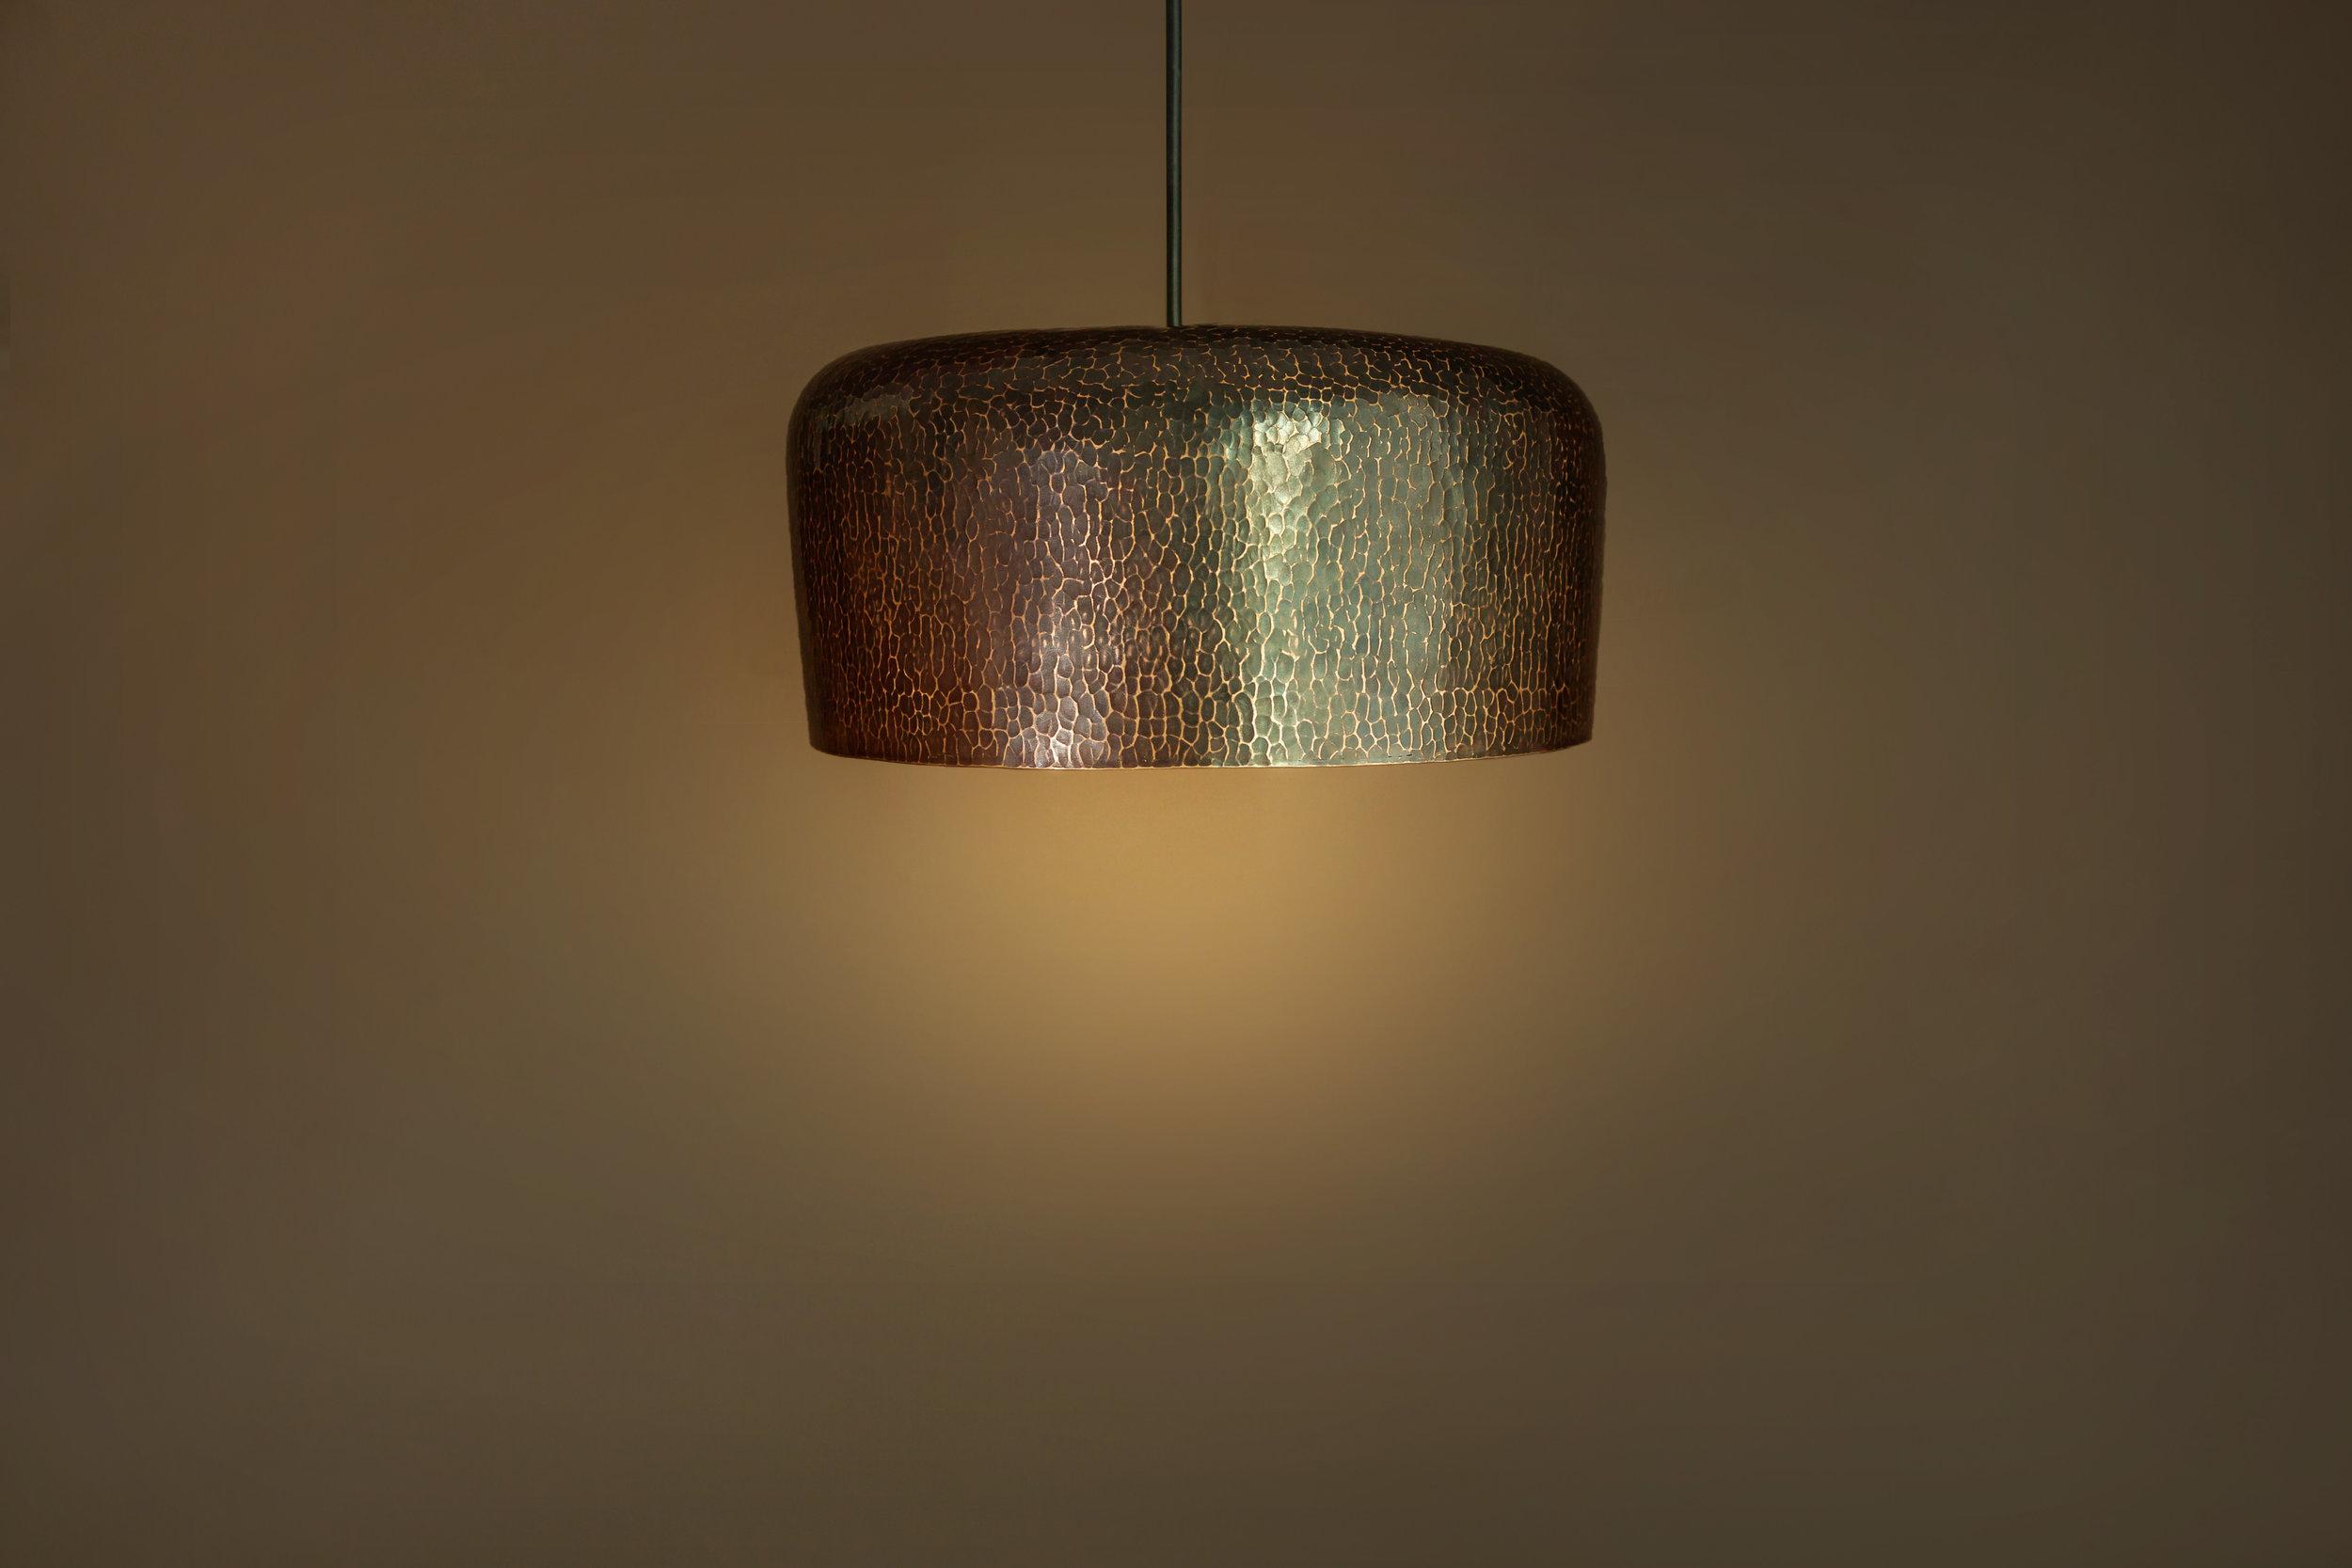 zoe - HI lamps 04.JPG